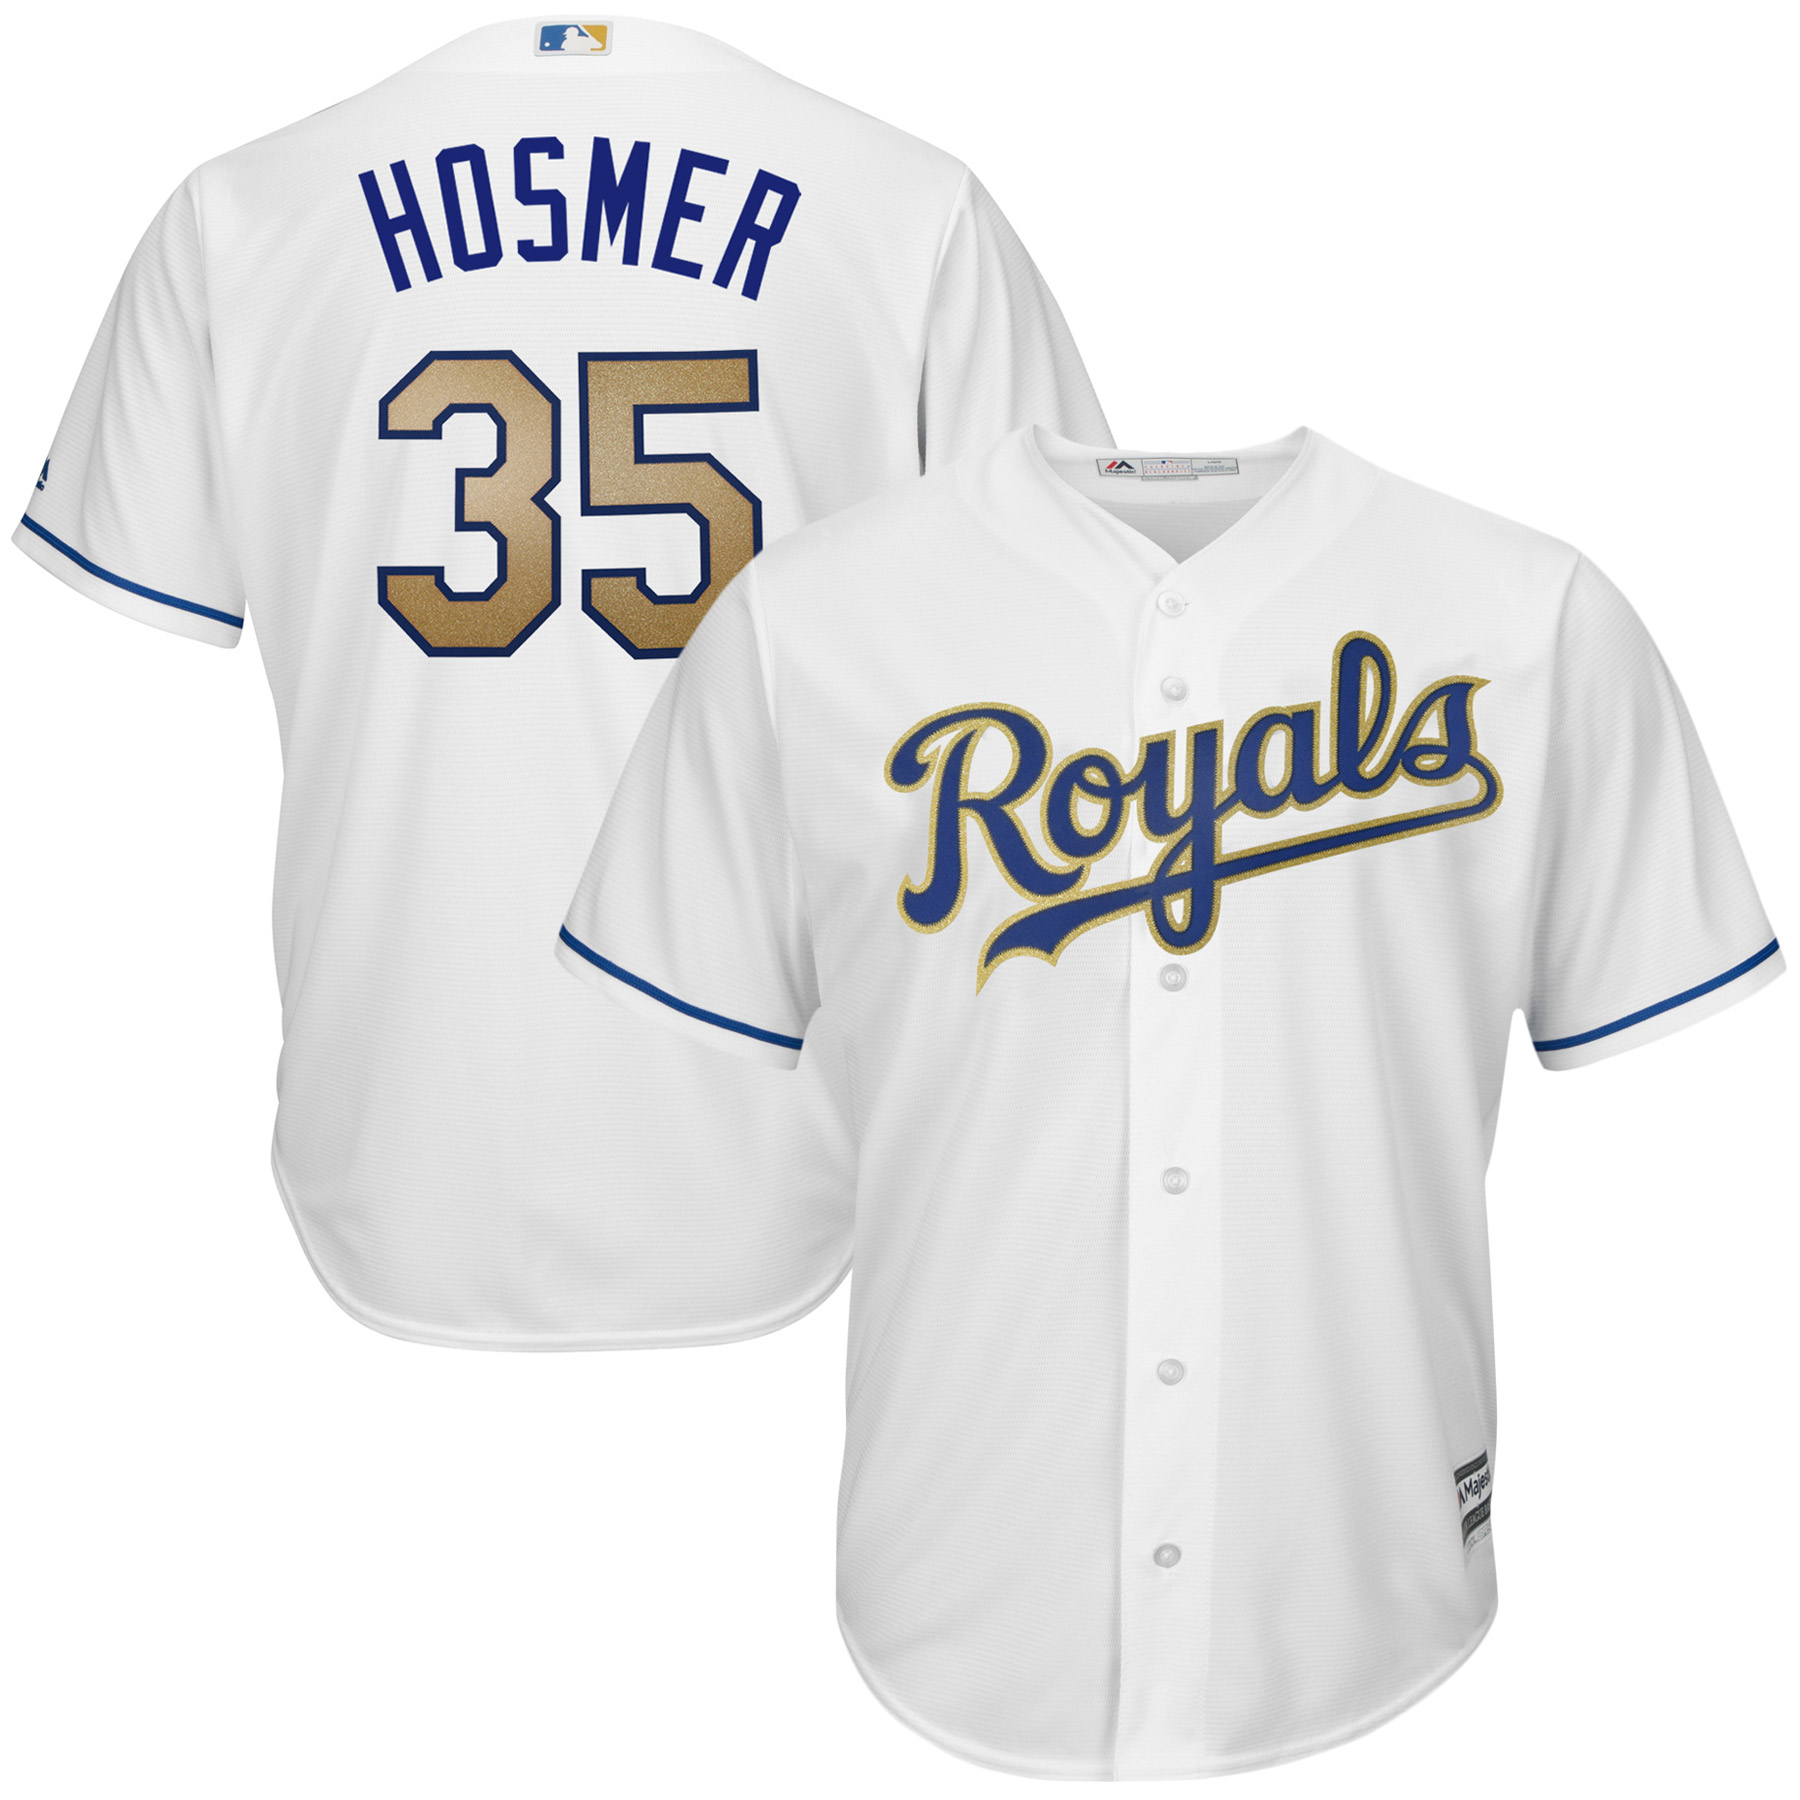 Eric Hosmer Kansas City Royals Majestic 2017 Home Cool Base Replica Jersey - White